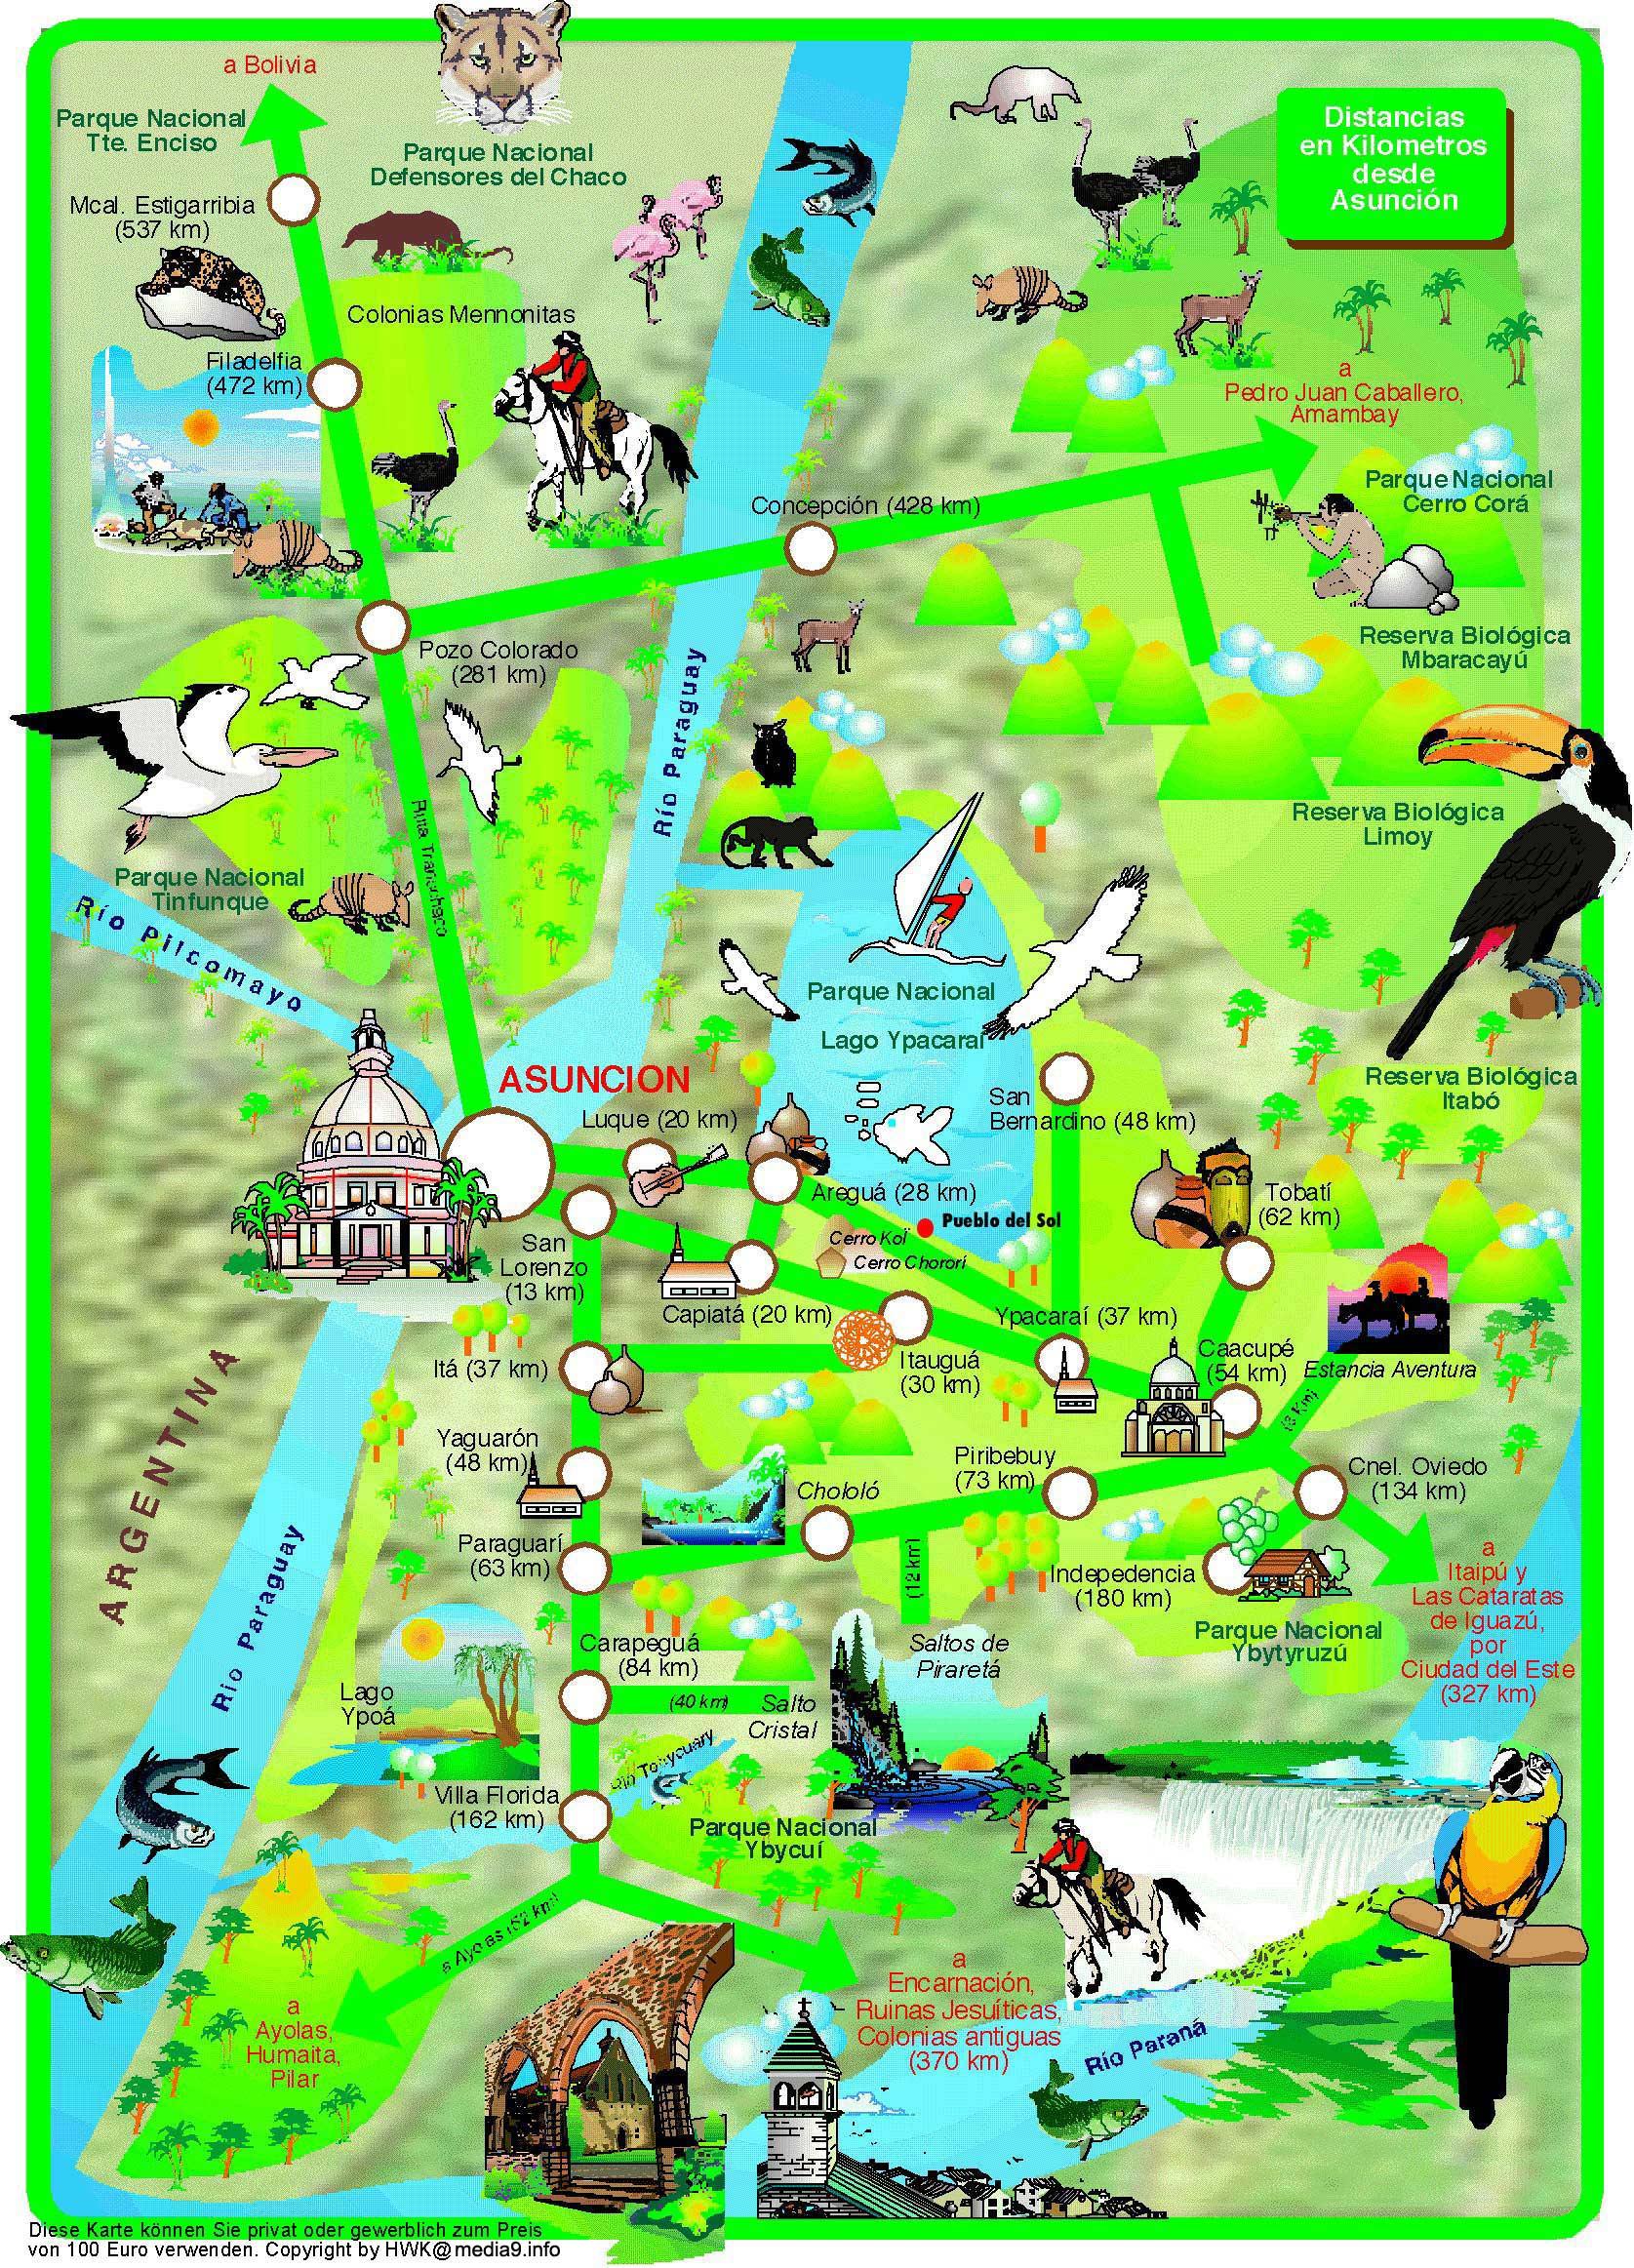 impressum - map of paraguay